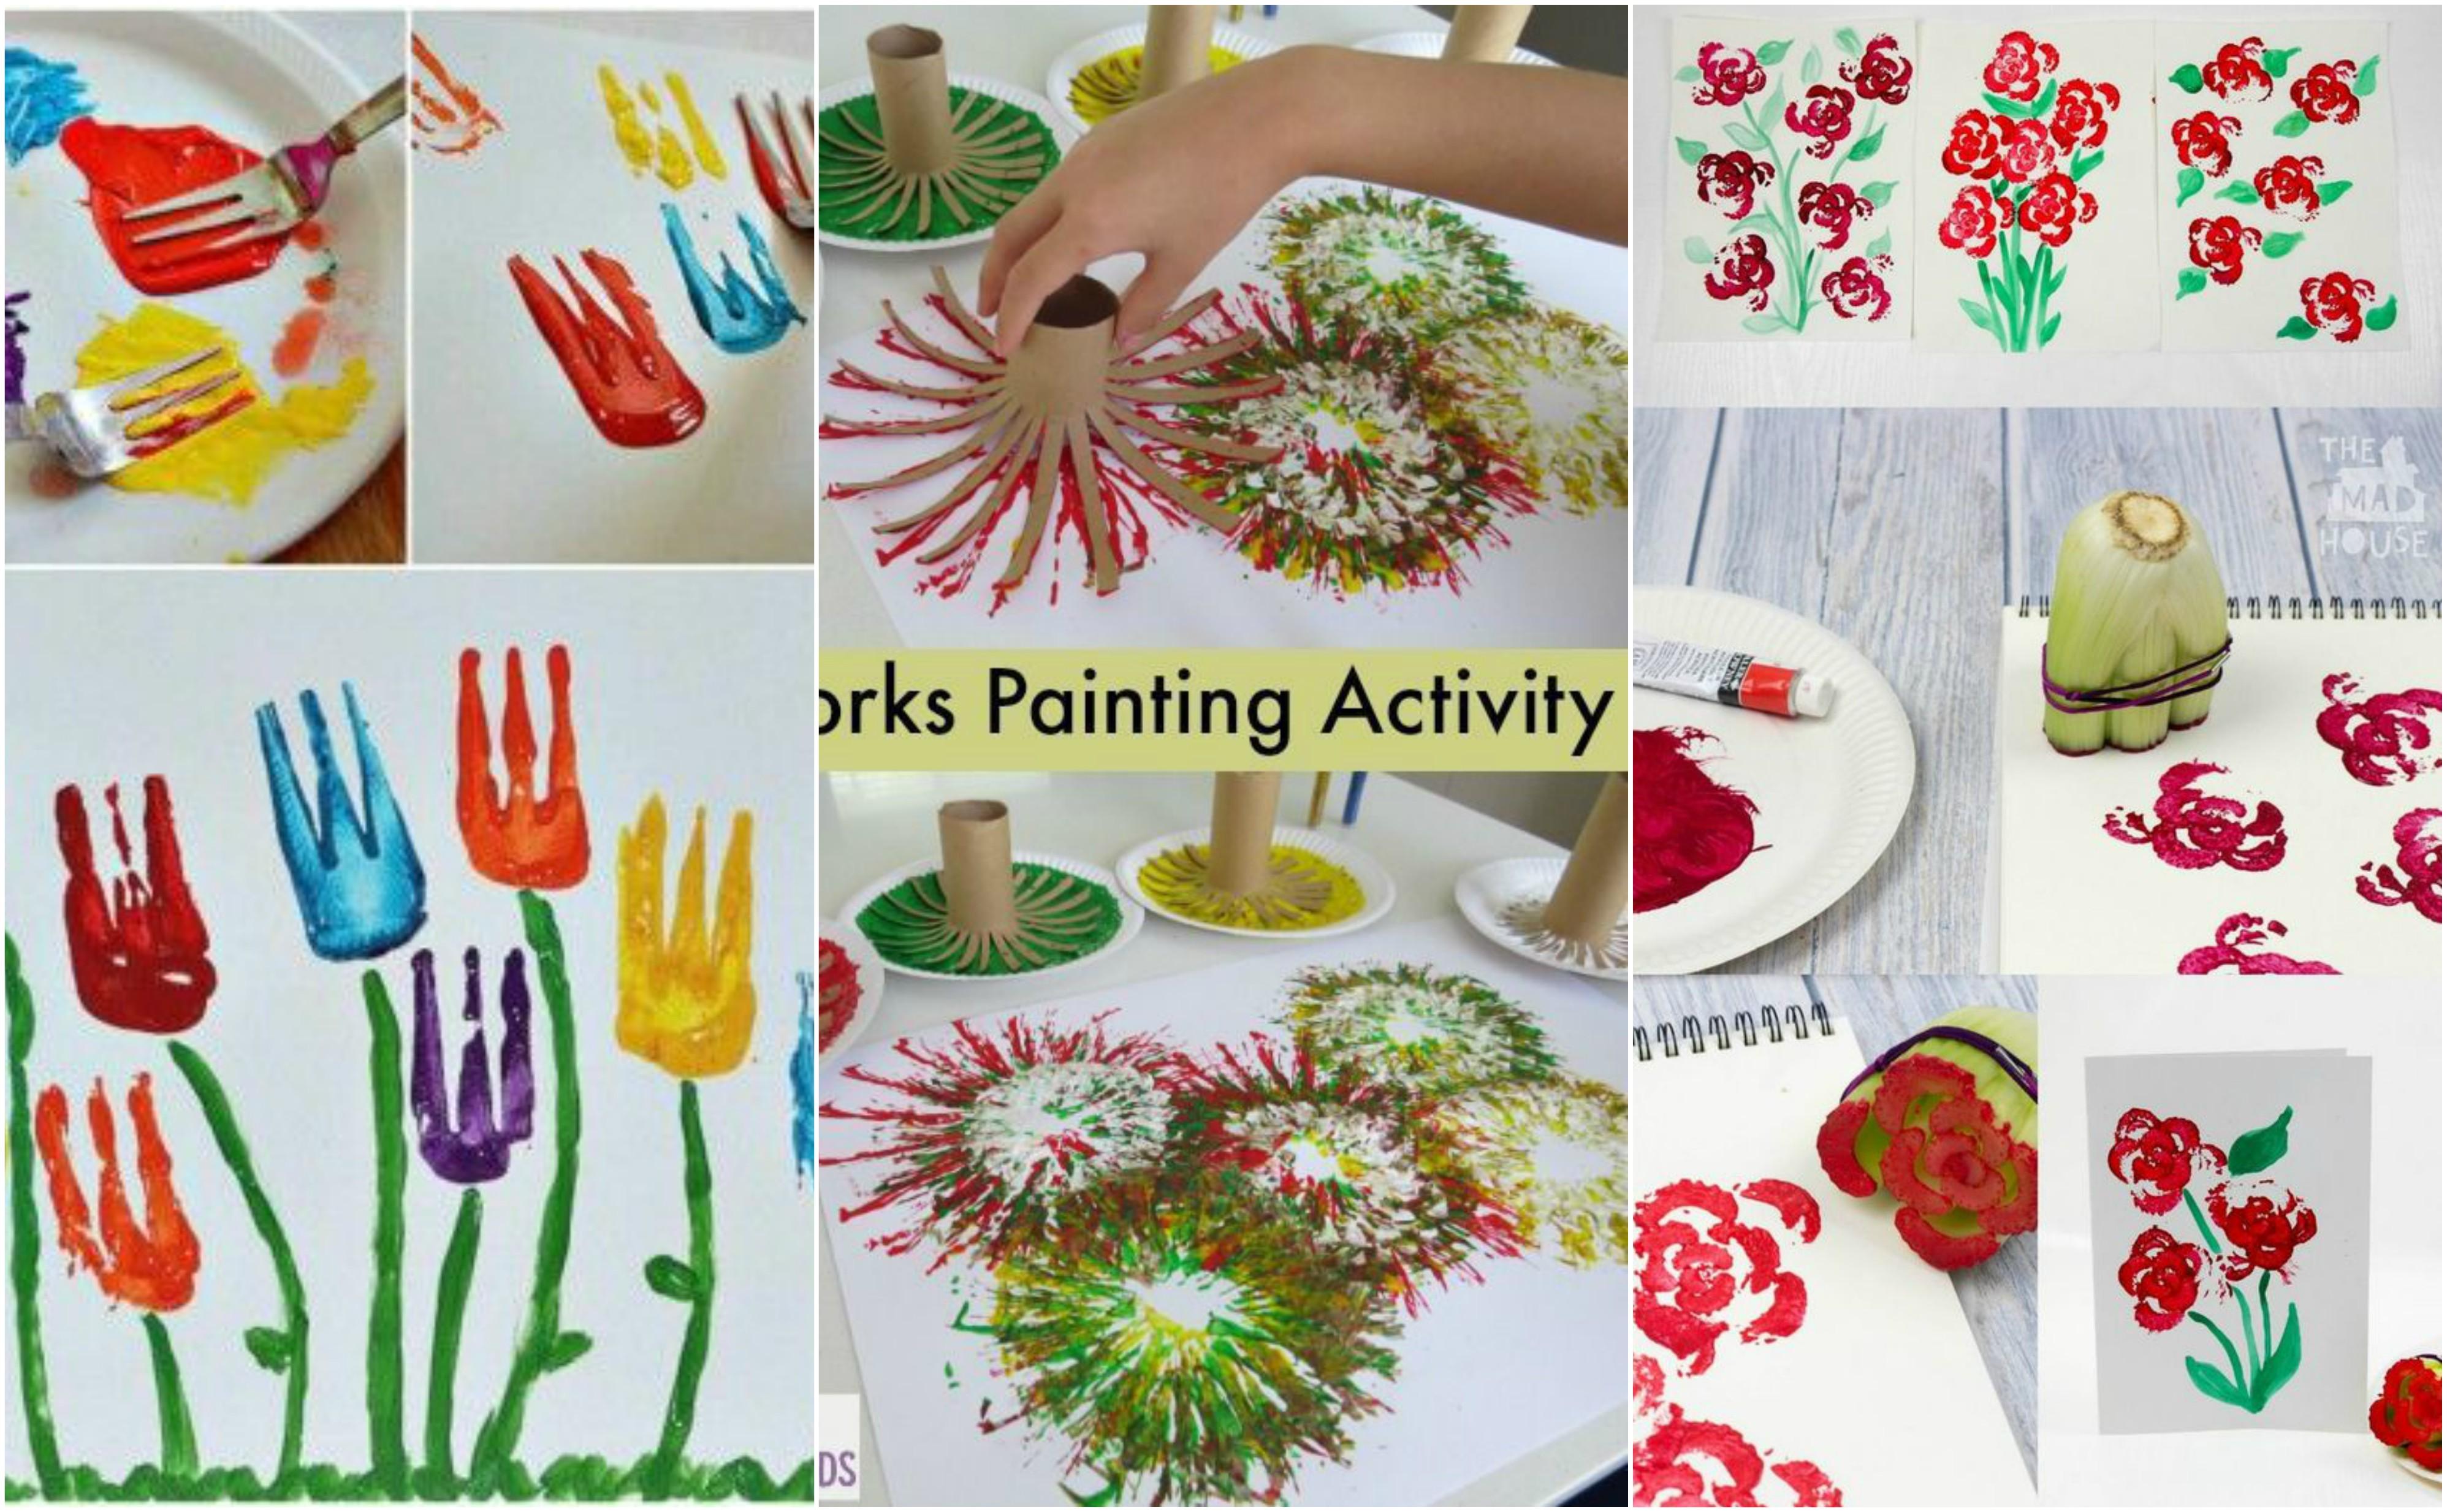 Malen Aktivitäten mit Kindern - 10 kreative Ideen